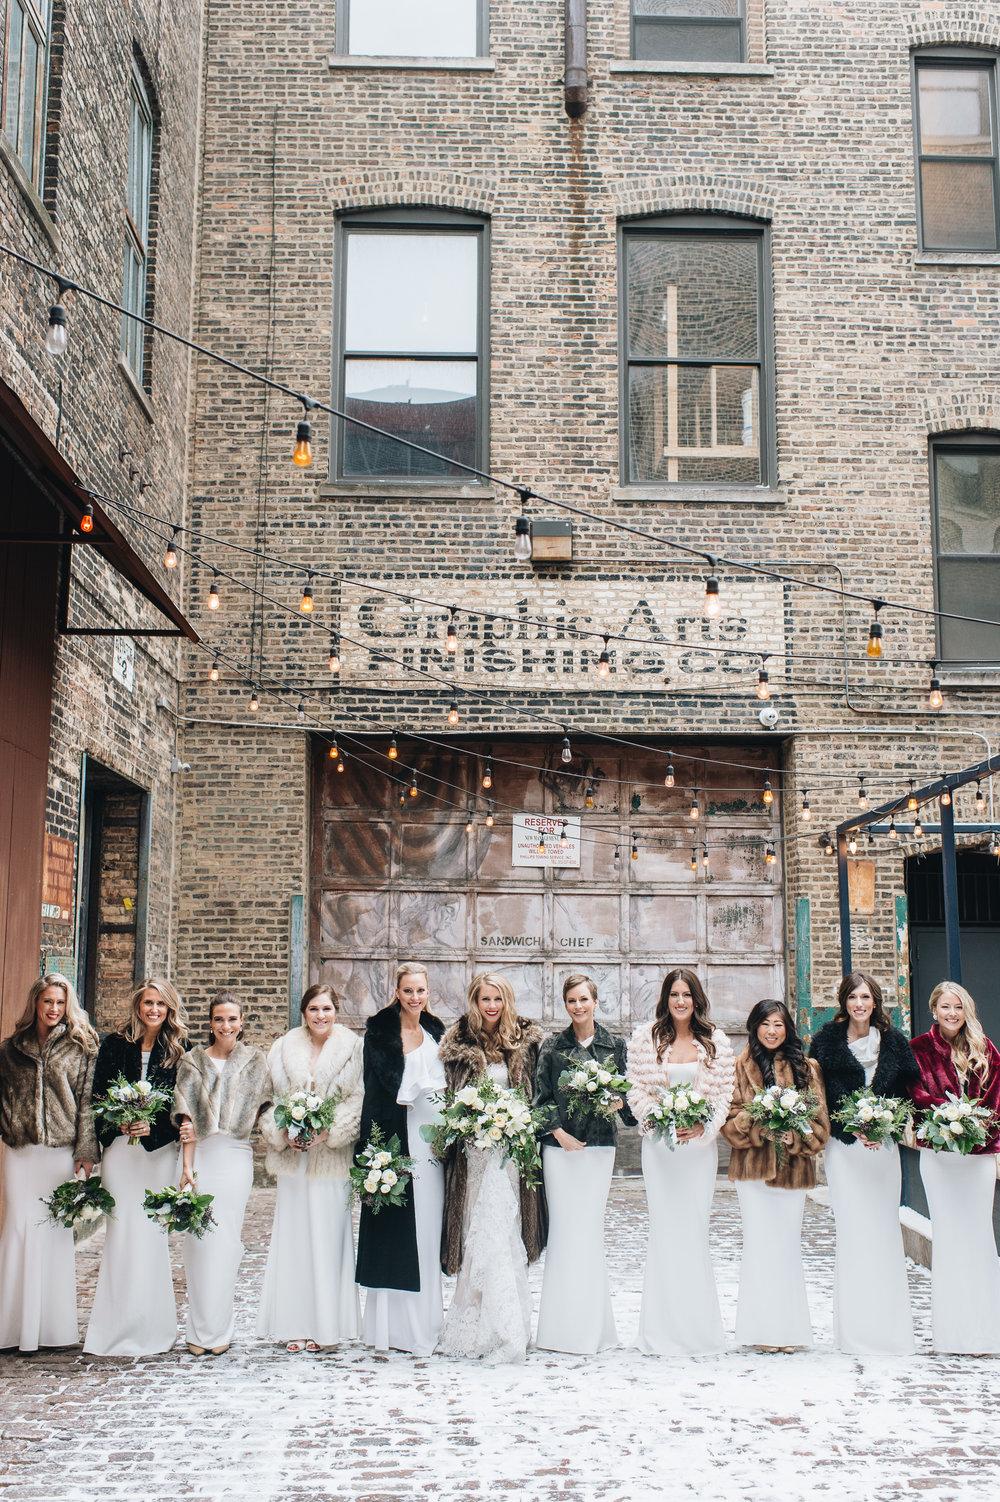 weddingparty-paperantler-0042.jpg